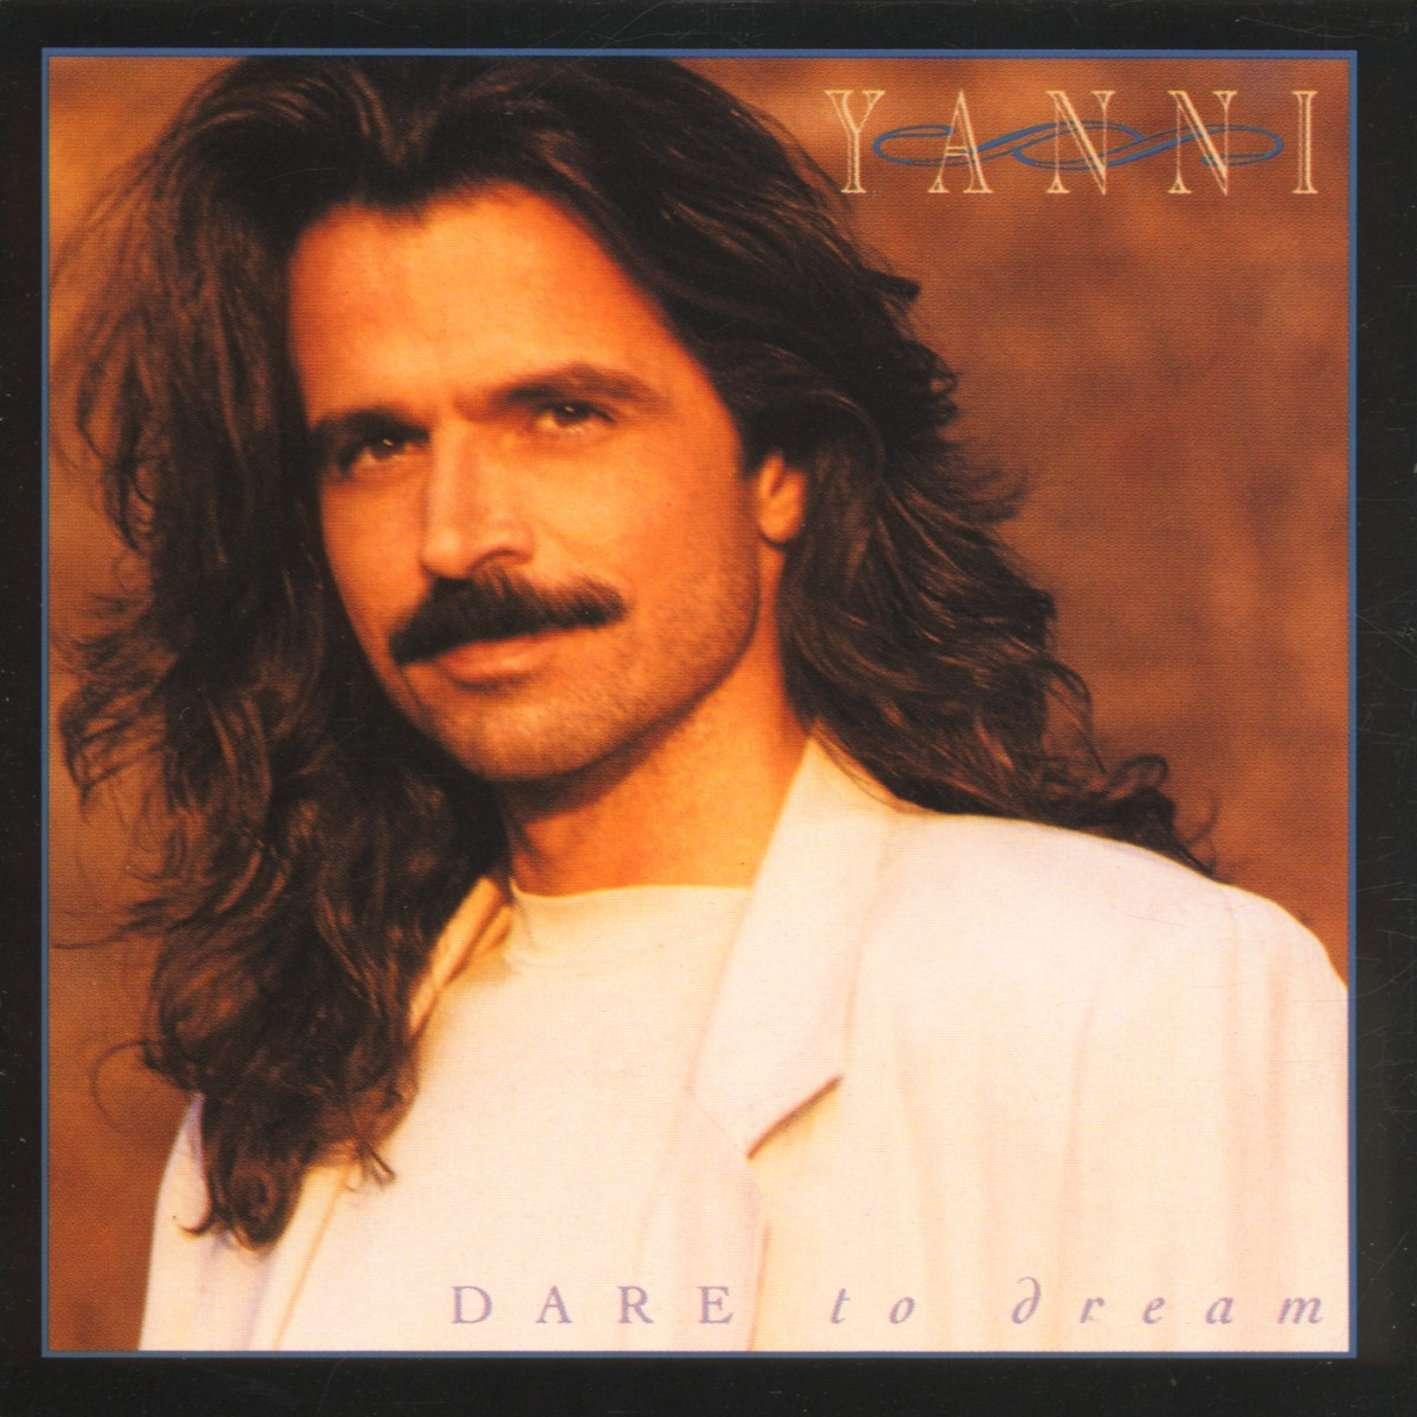 Yanni《Dare To Dream》[CD级无损/44.1kHz/16bit]